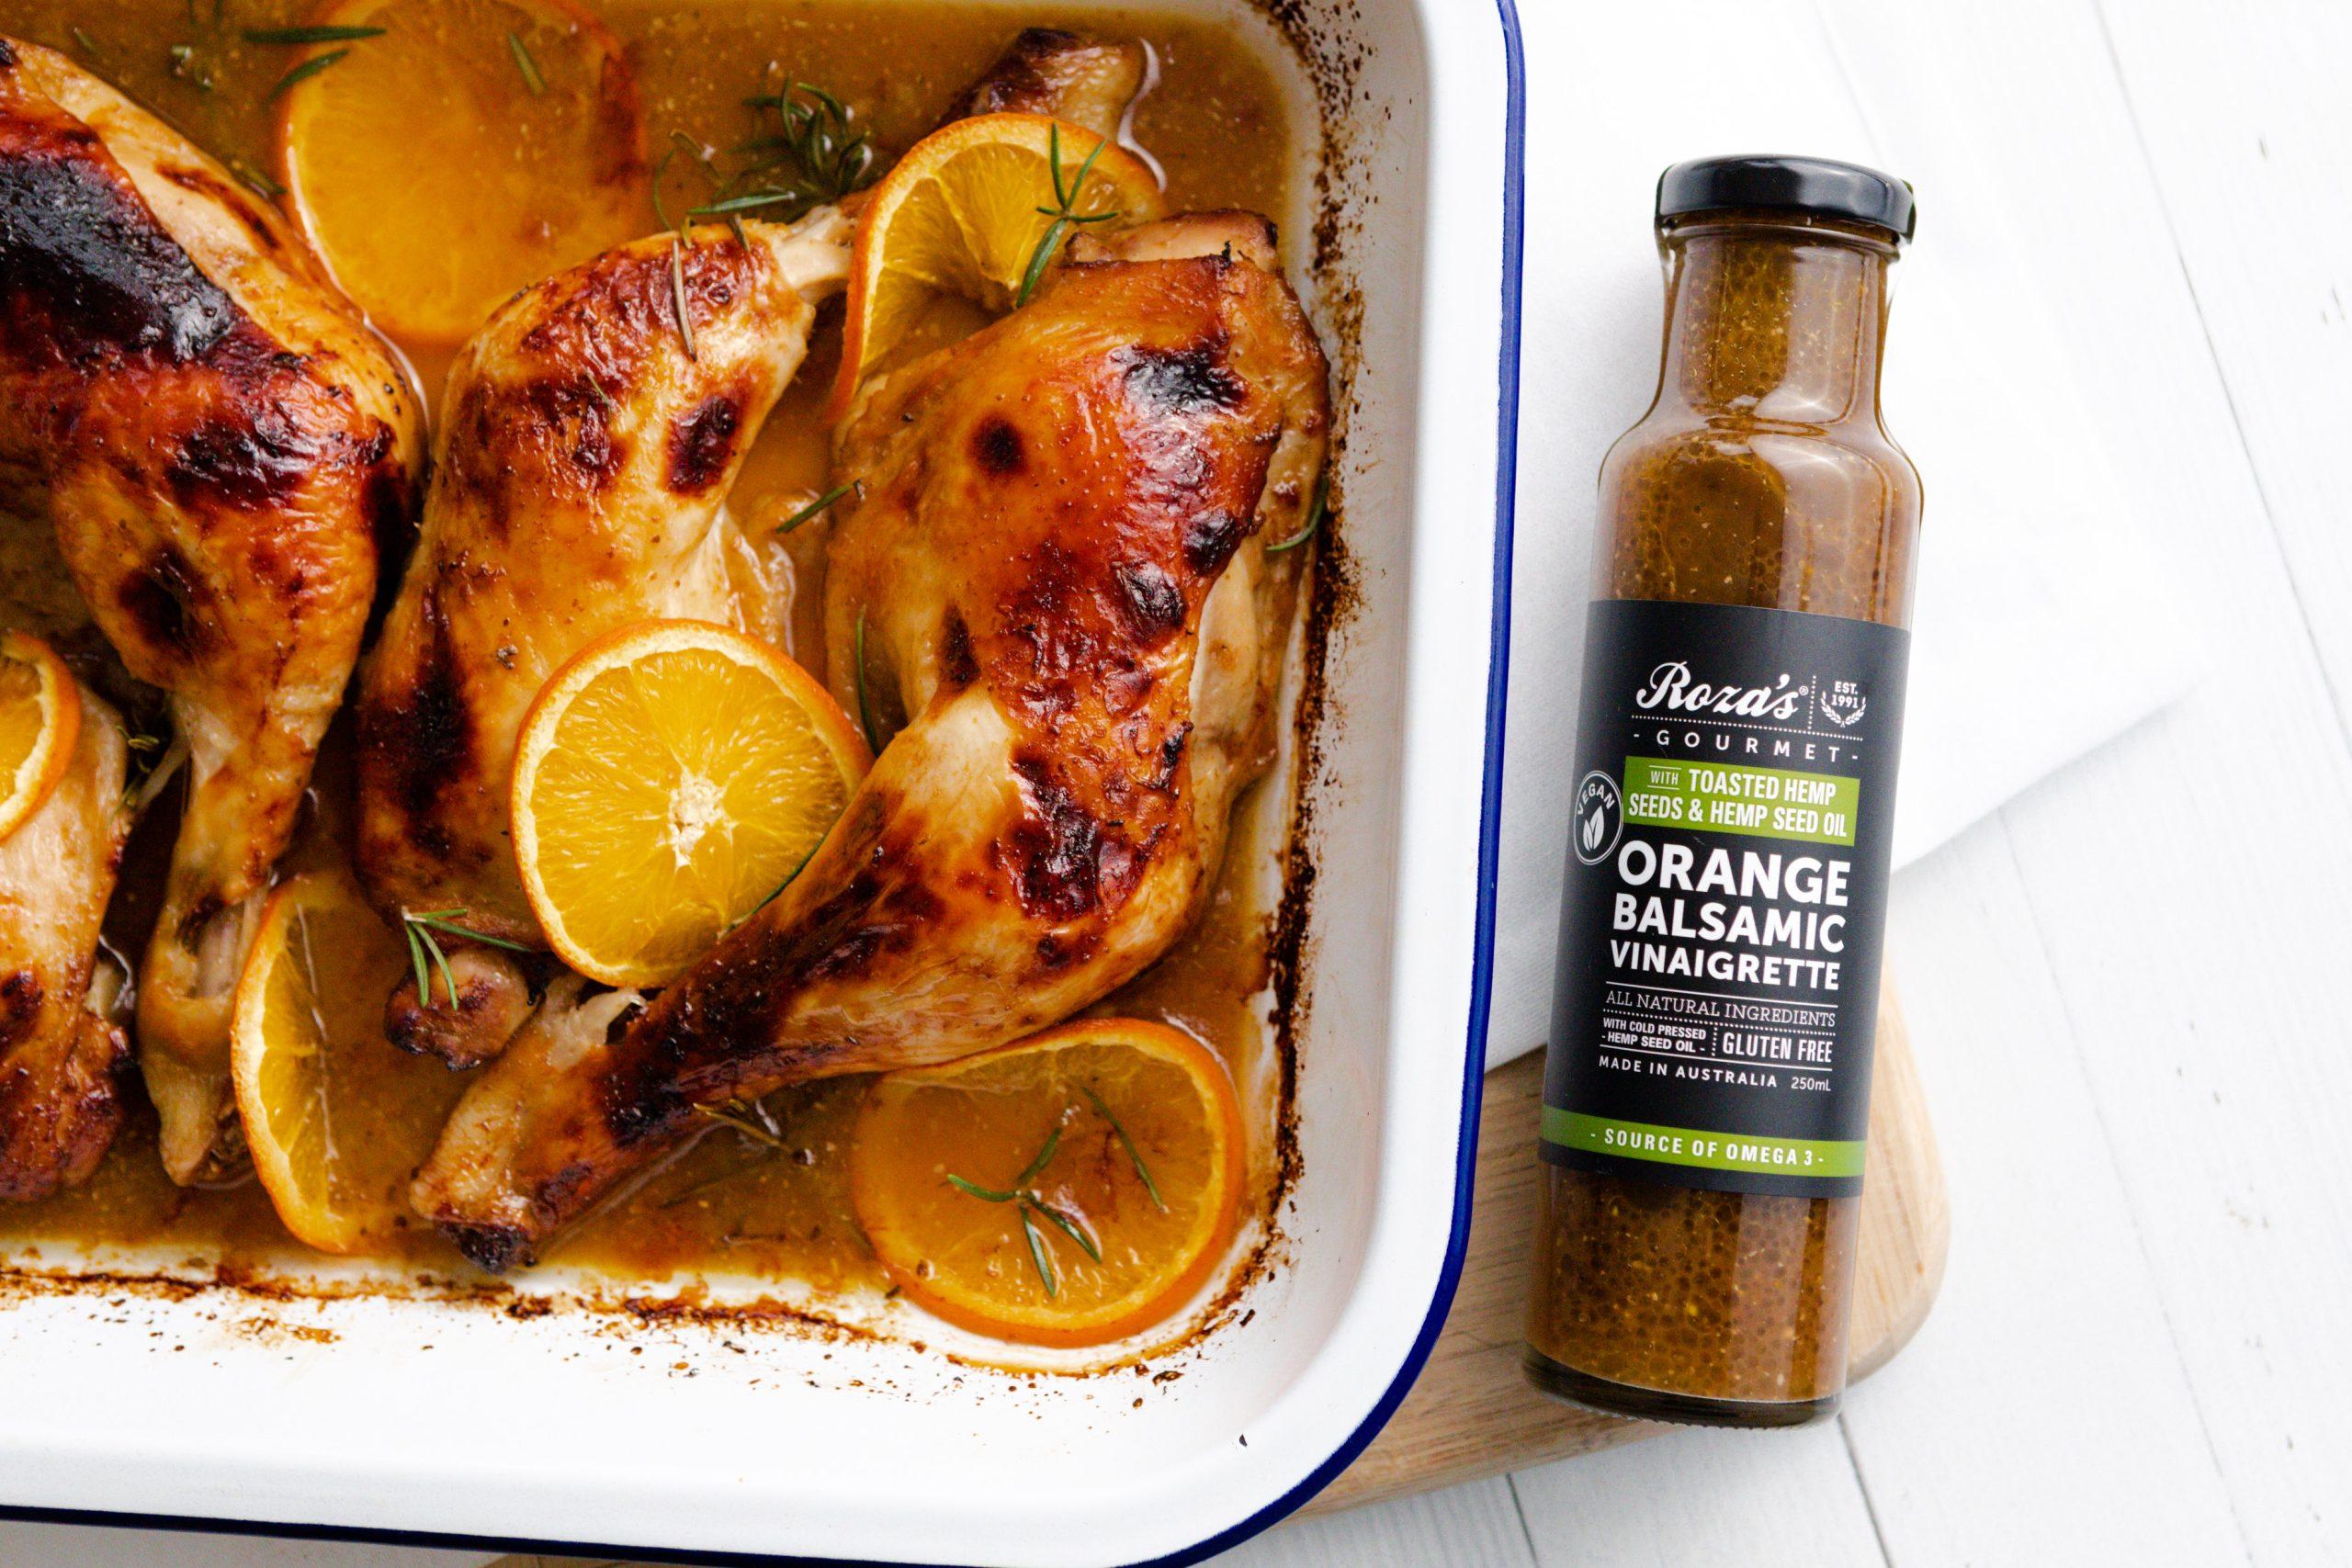 Roza's Gourmet Orange Balsamic Baked Chicken Recipe